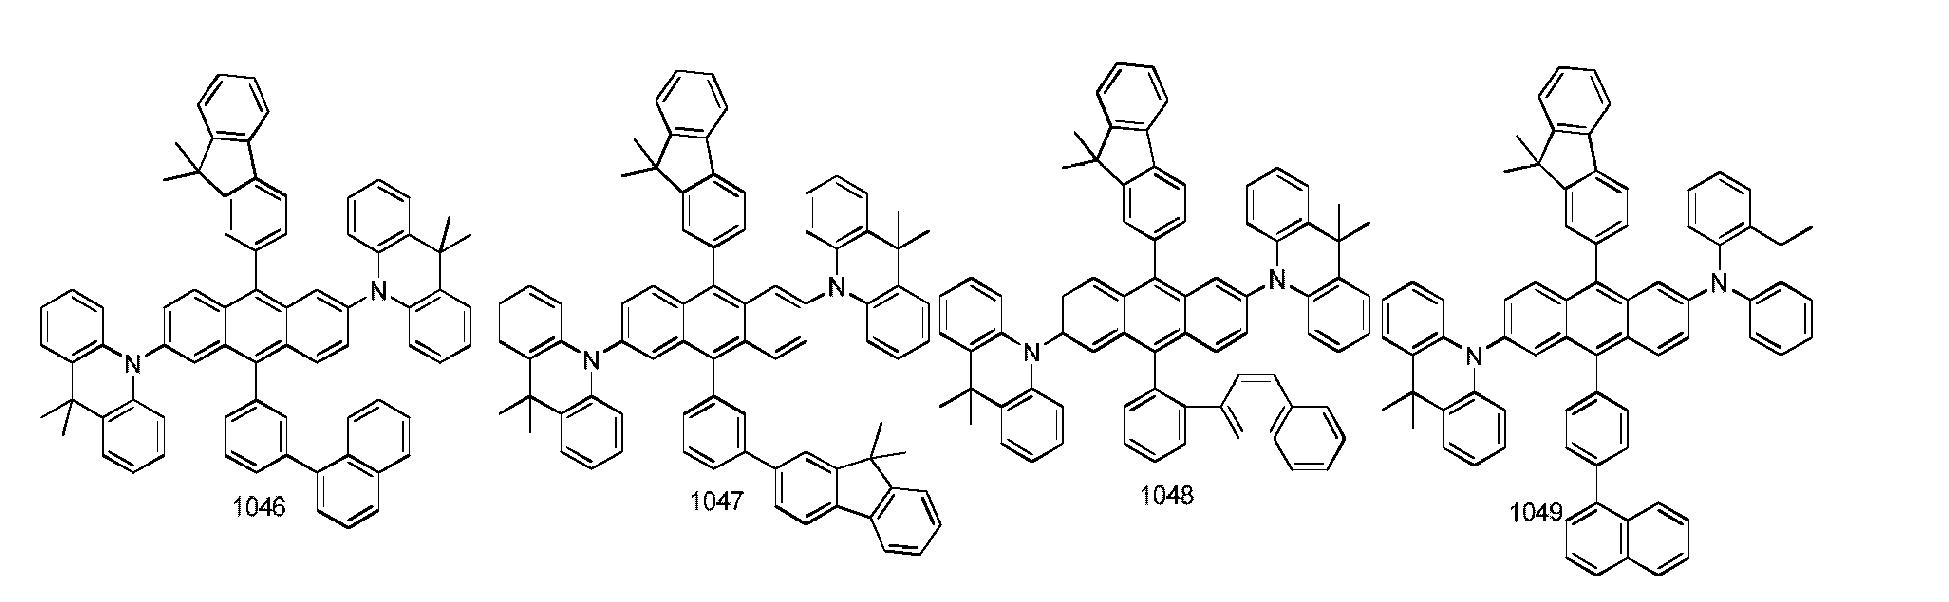 Figure imgb0162